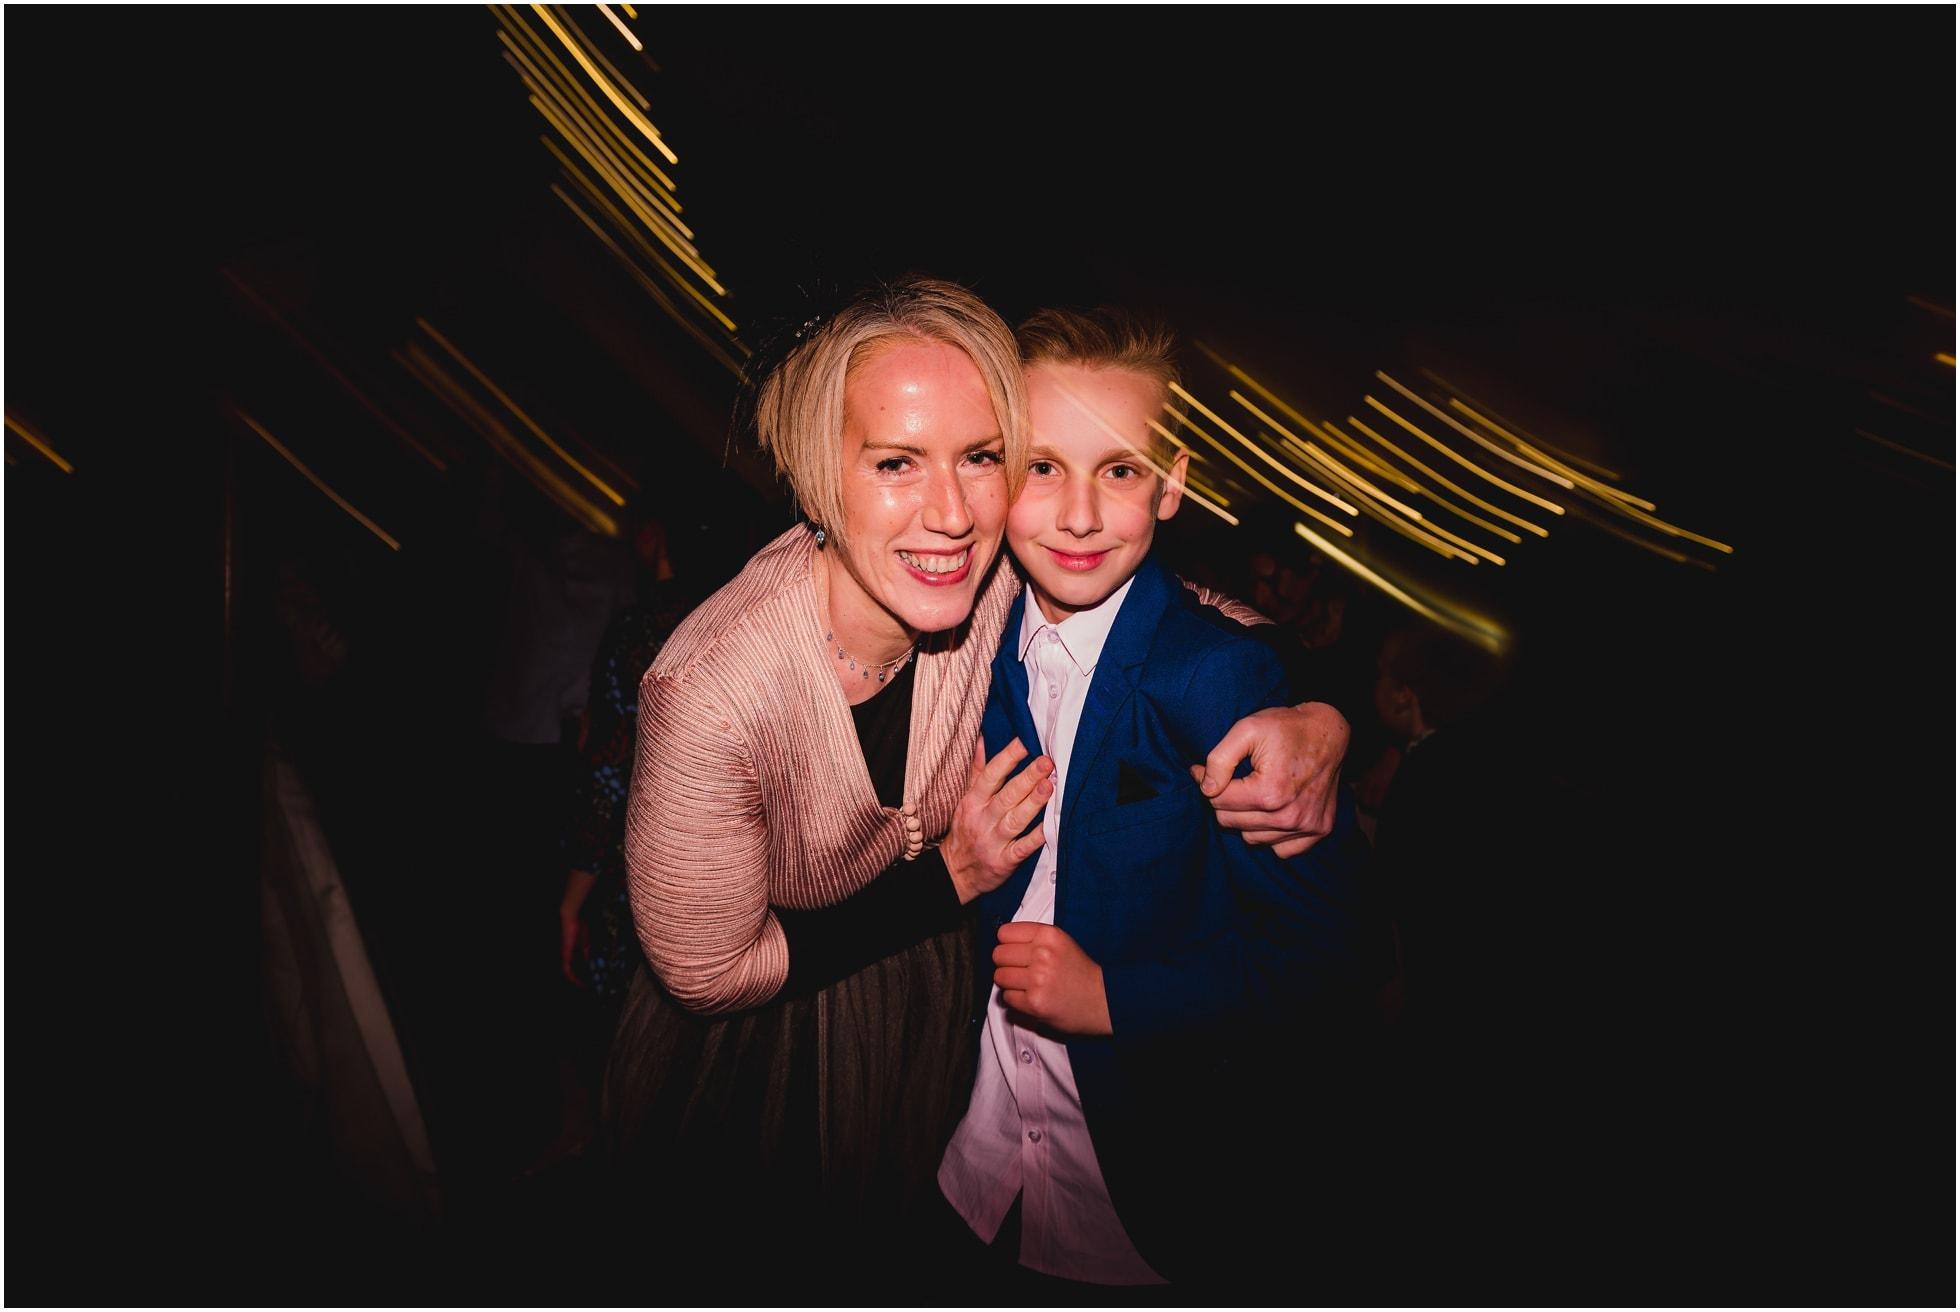 Mum and son on the dancefloor